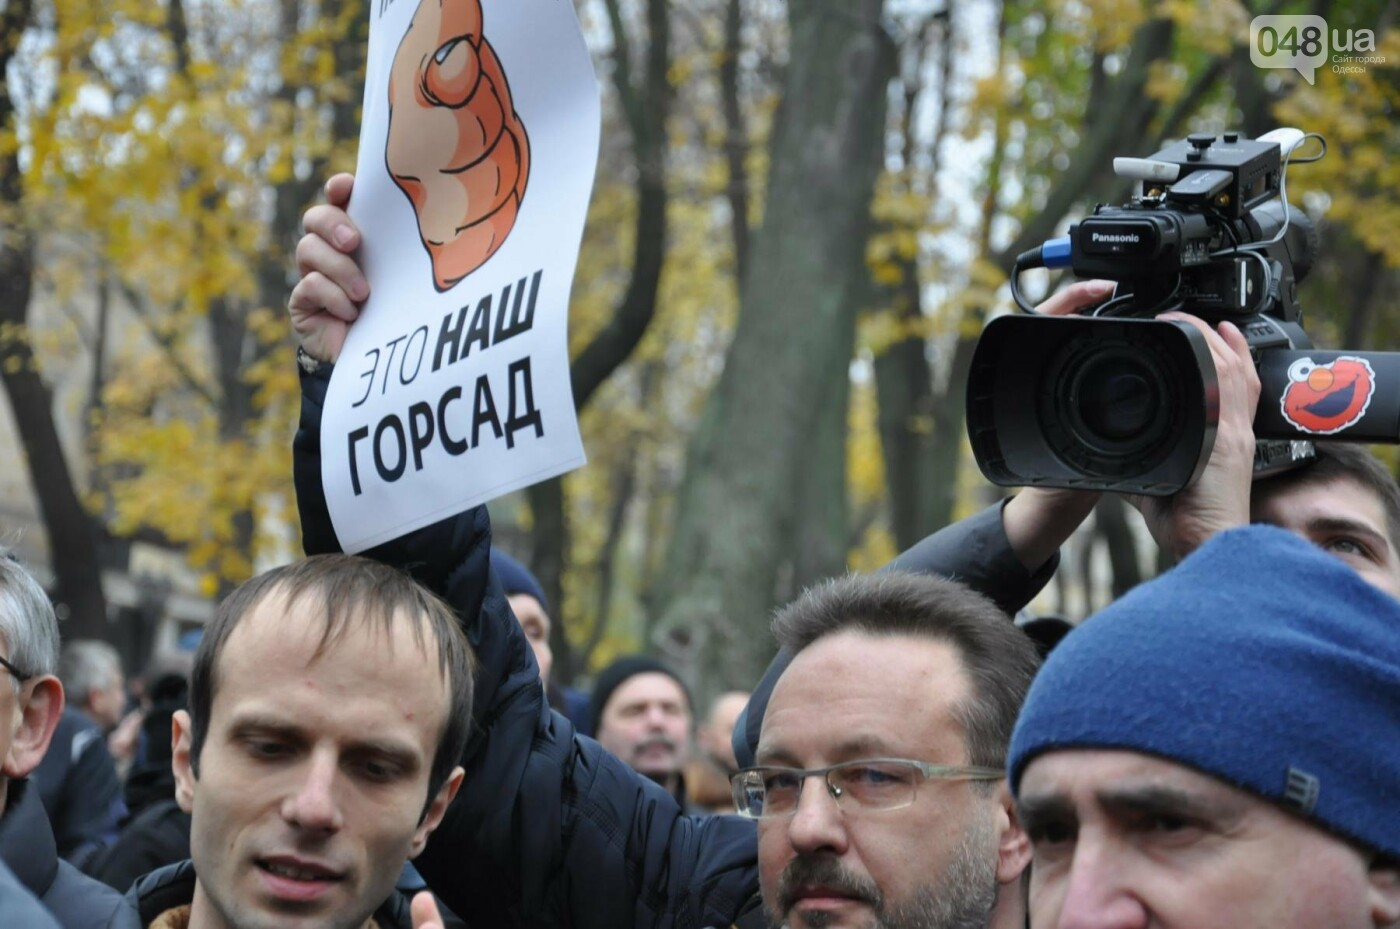 Около 5 сотен одесситов протестовали против застройки Горсада (ФОТО) , фото-5